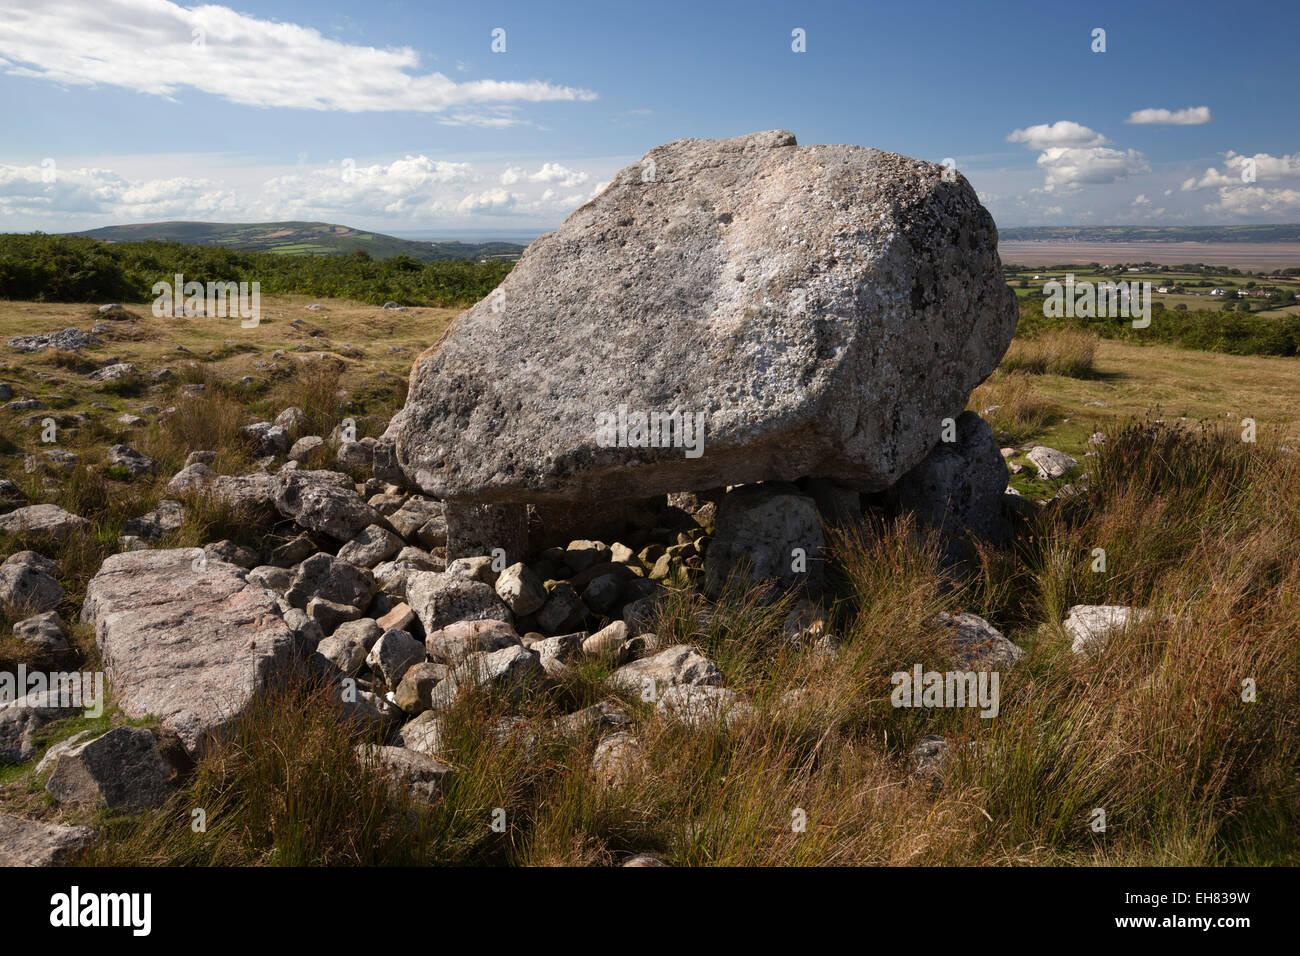 Arthur's Stone (Maen Ceti, Maen Cetty) a Neolithic chambered dolmen, Gower Peninsula, Swansea, Glamorgan, Wales, - Stock Image